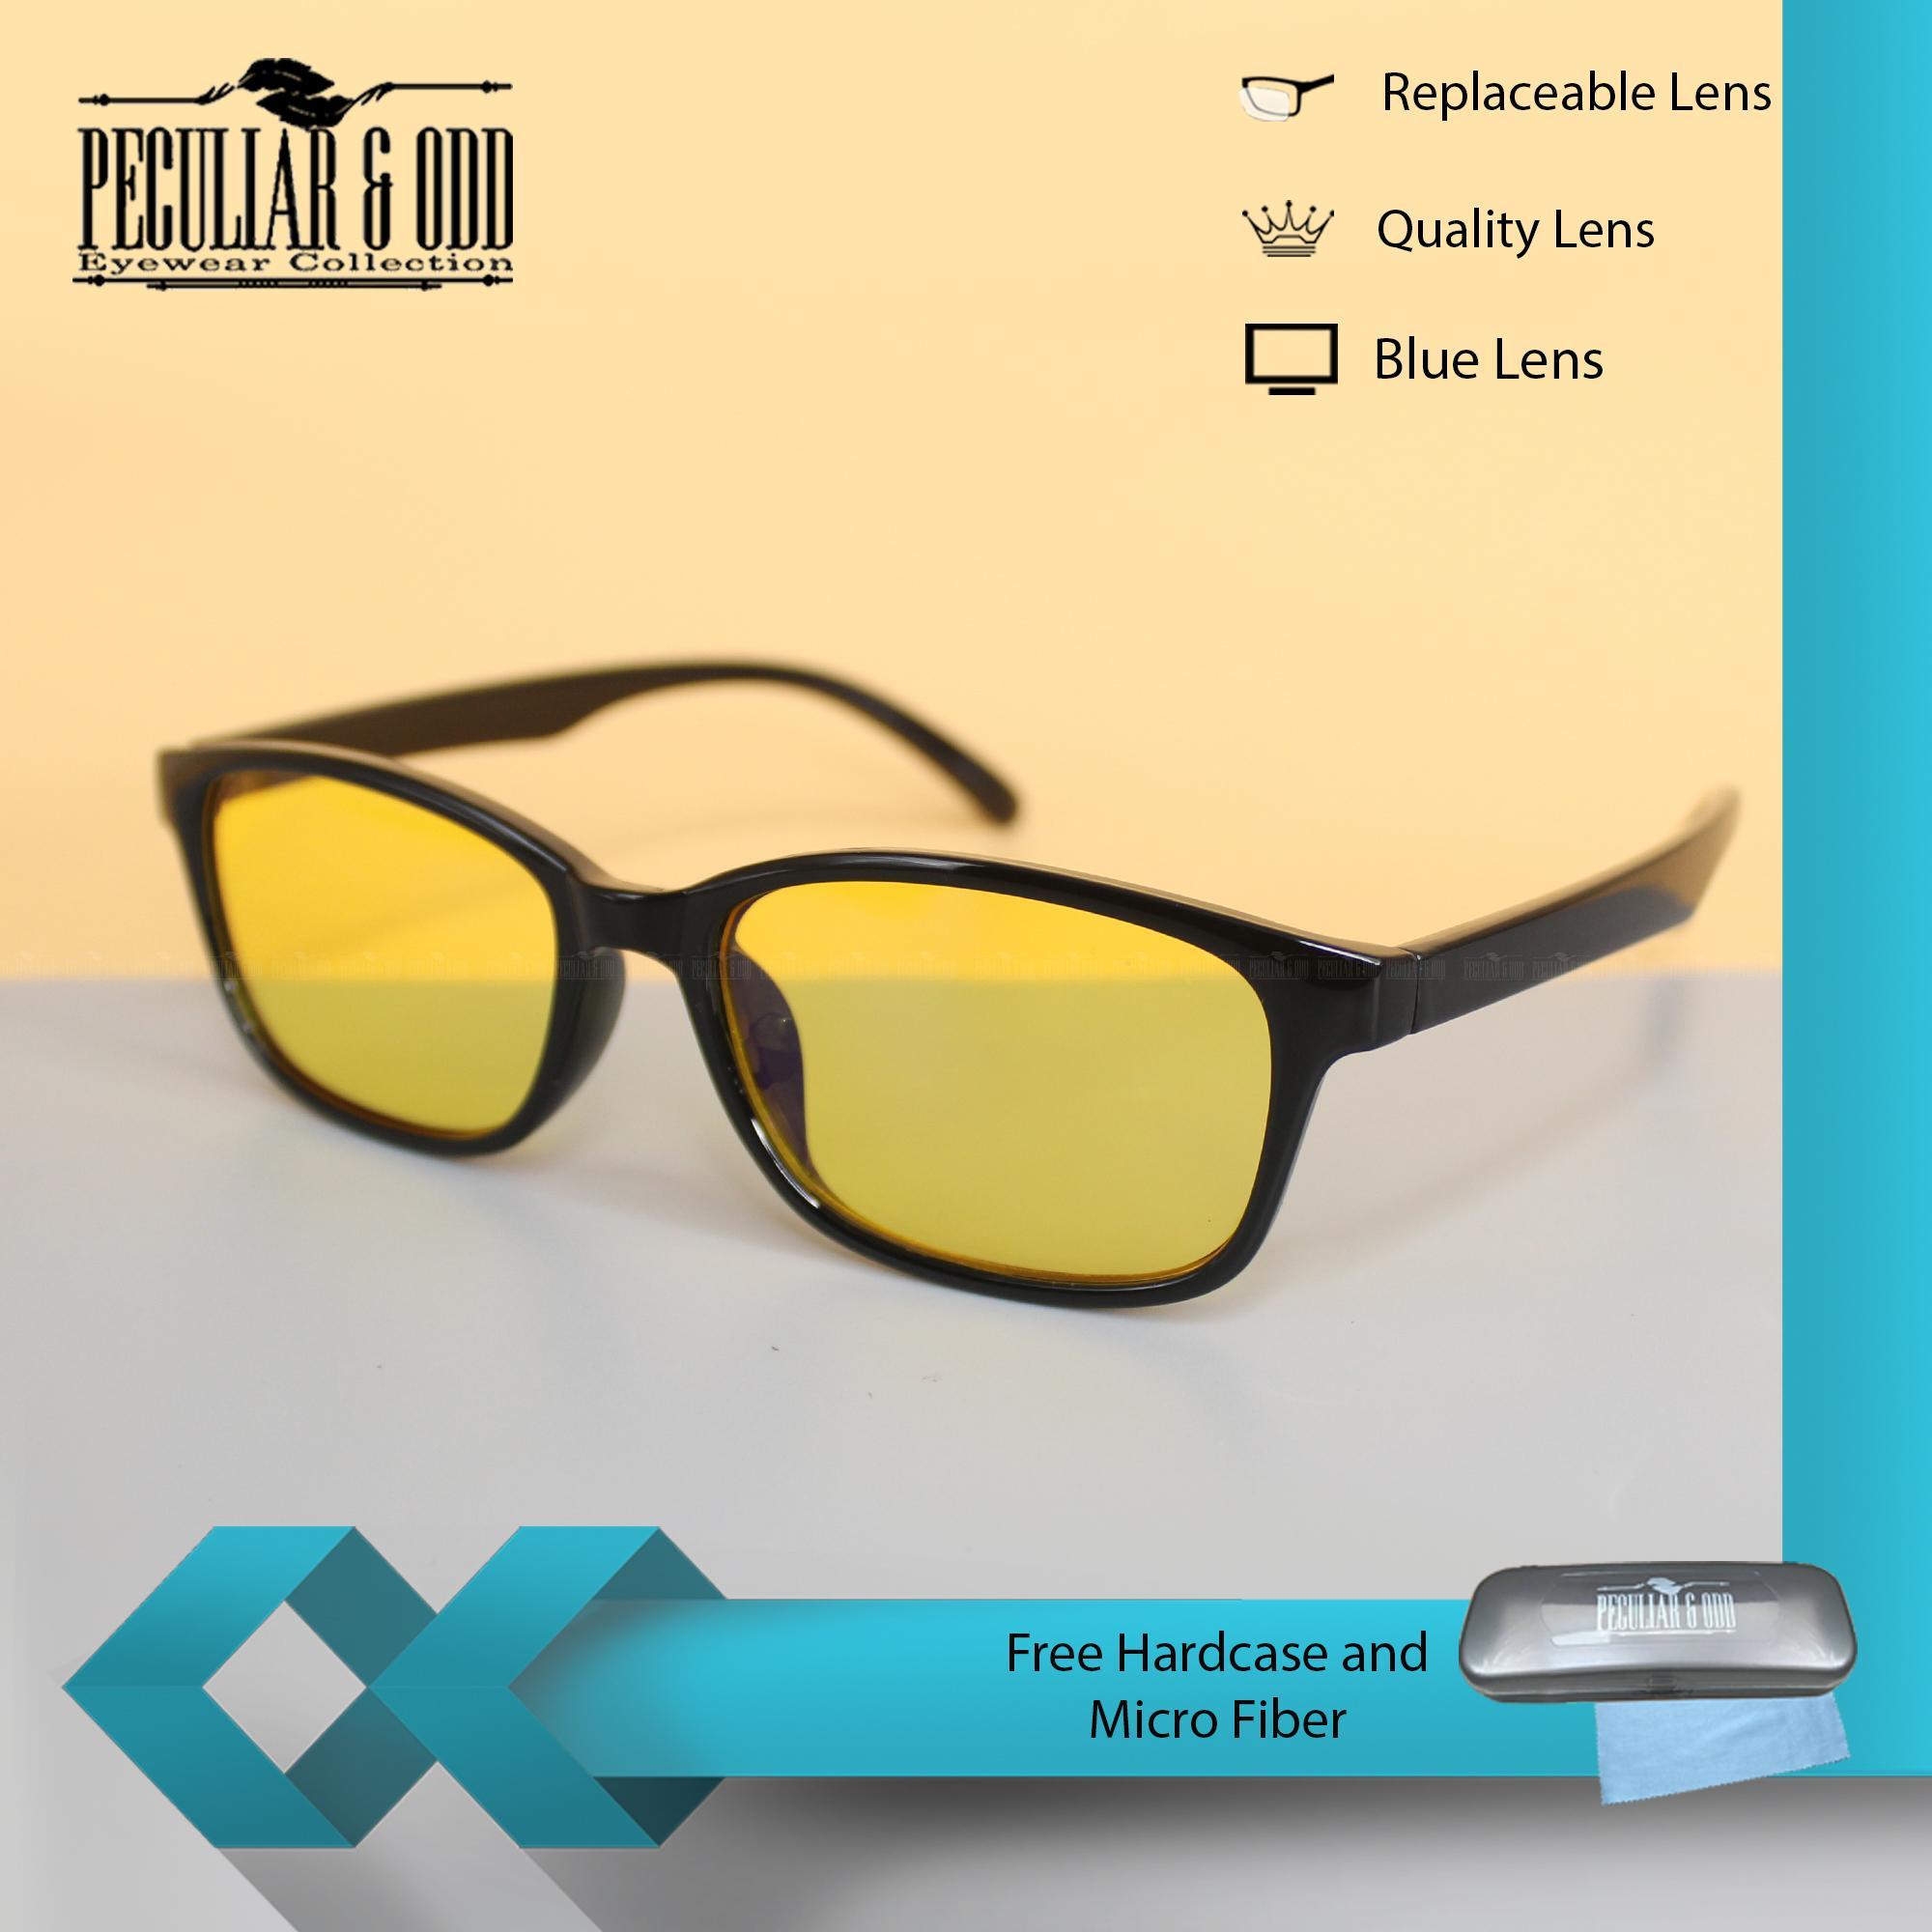 becb3b948e Peculiar Square 3028 BlackYellow Anti Radiation Computer Eyeglass Driving  Optical Replaceable Eyewear Unisex